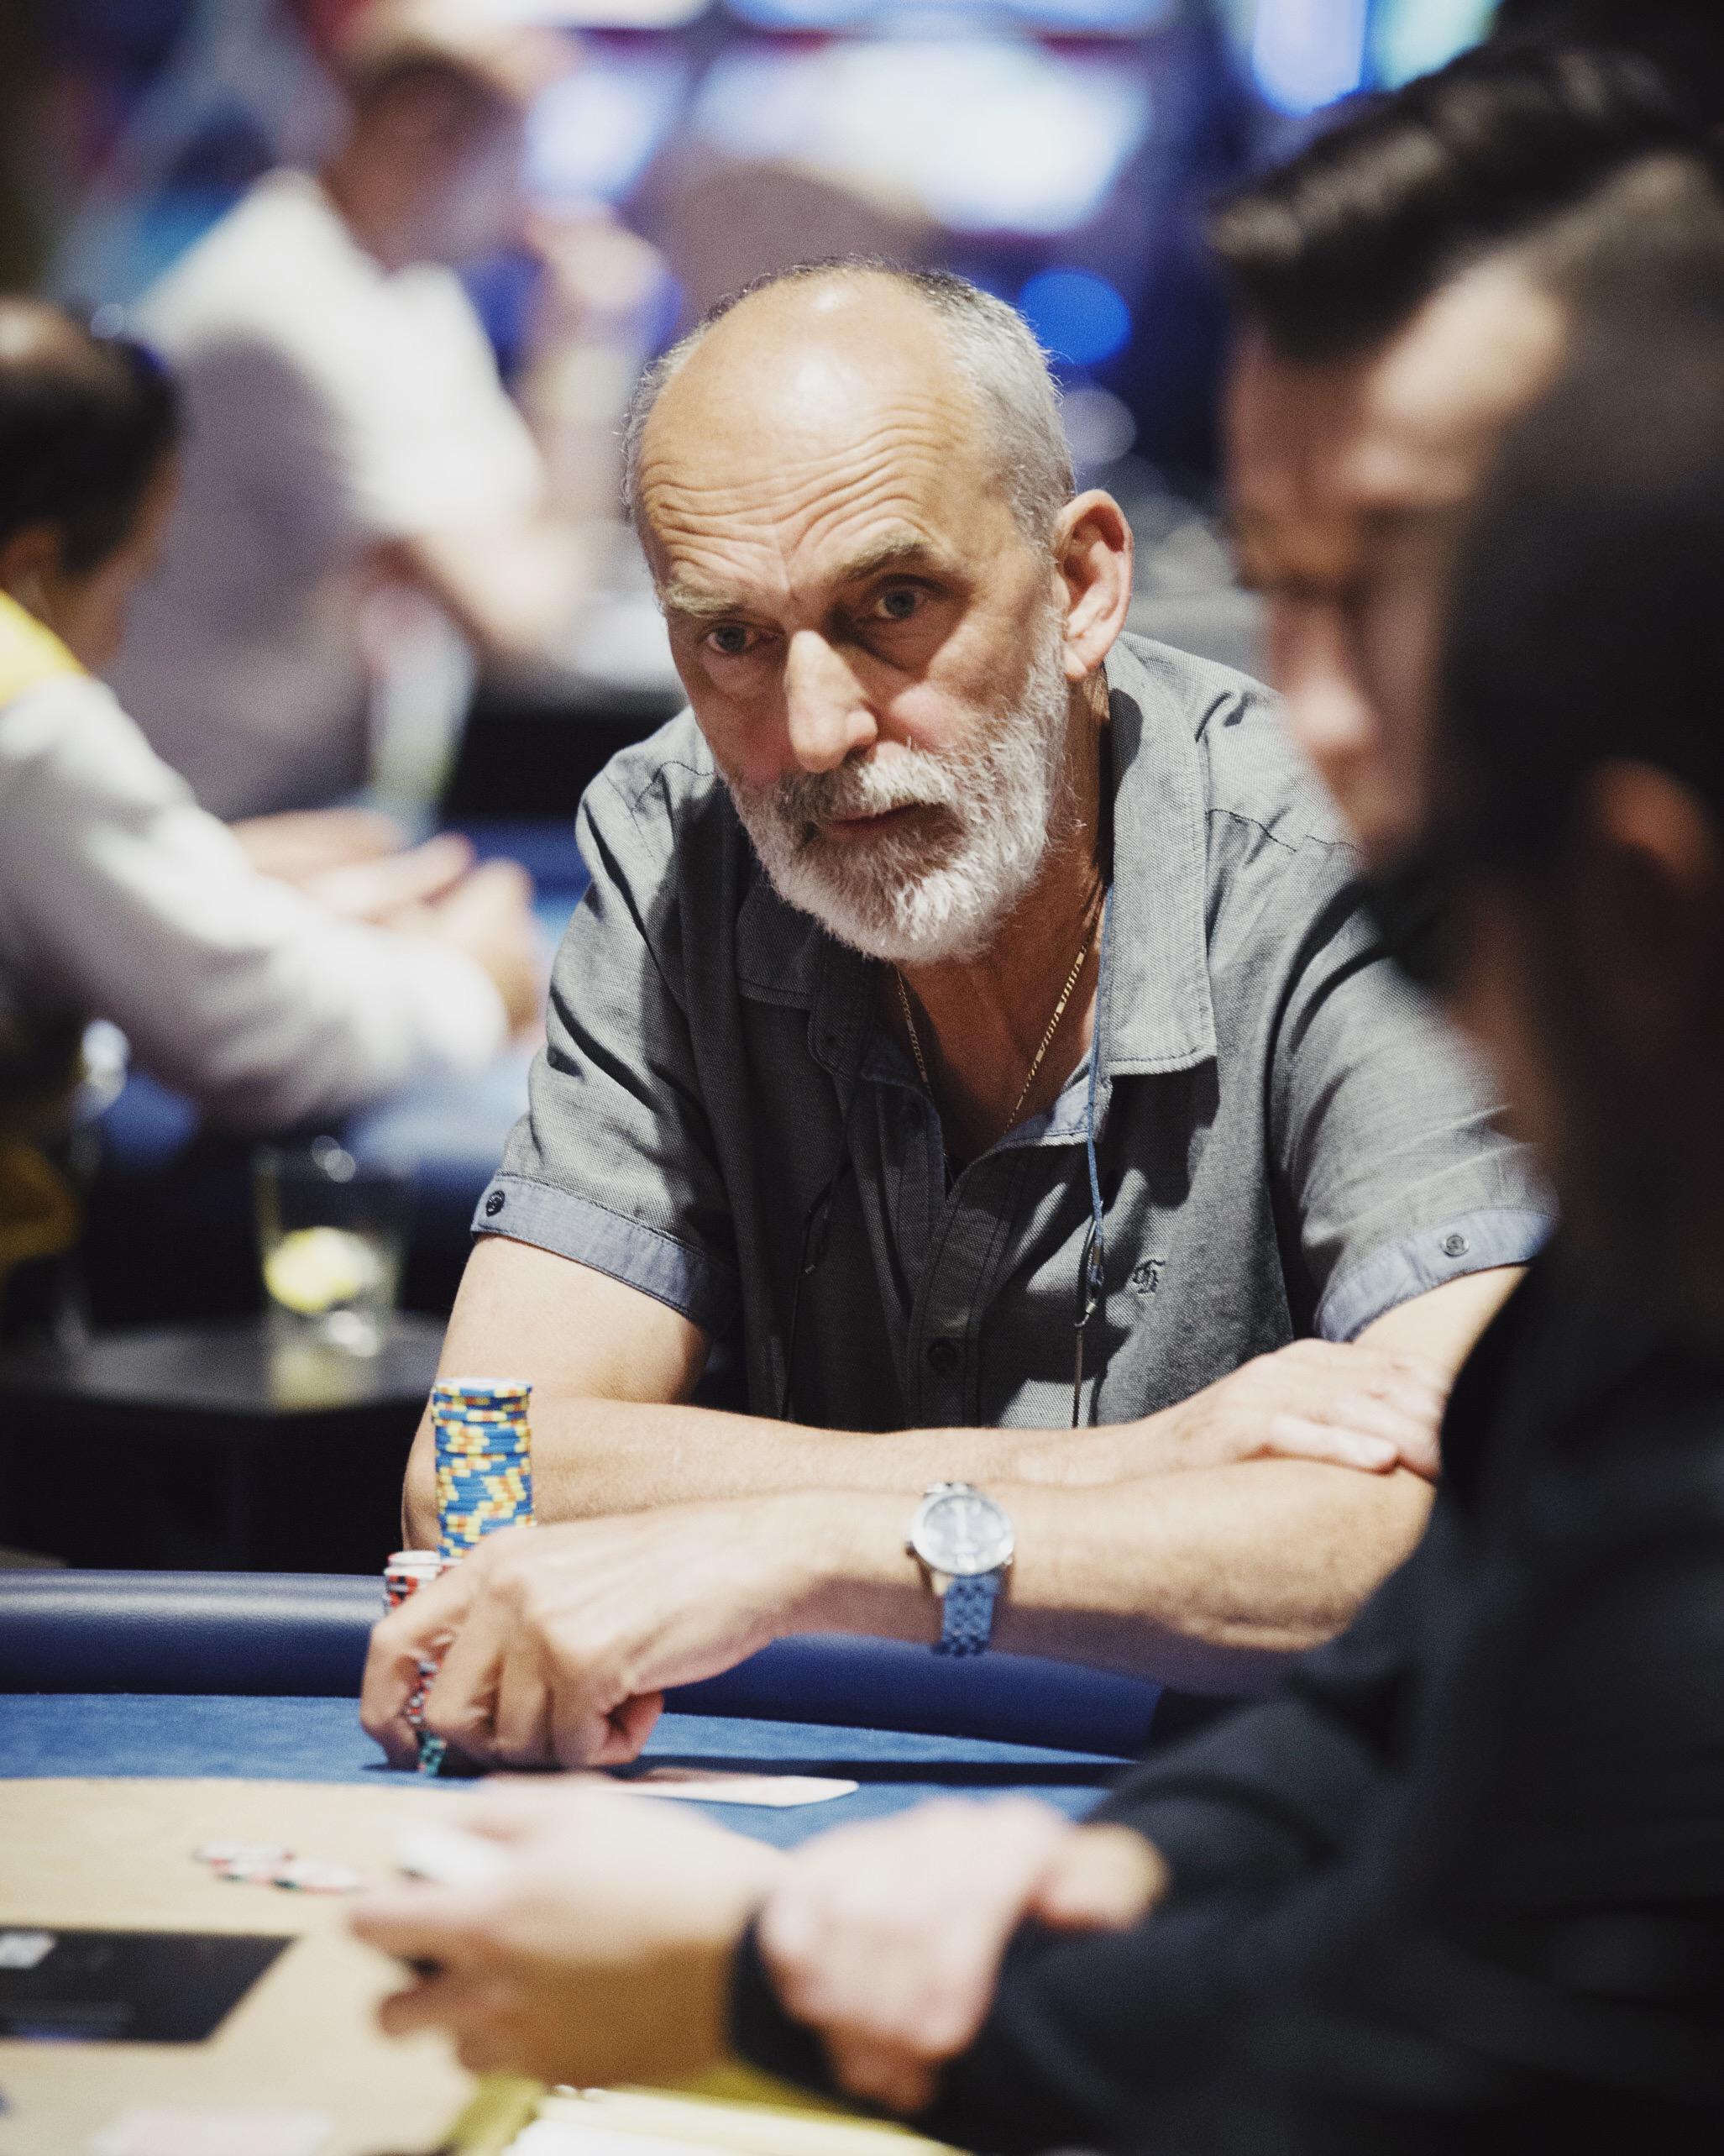 polina-shubkina-poker-005.JPG